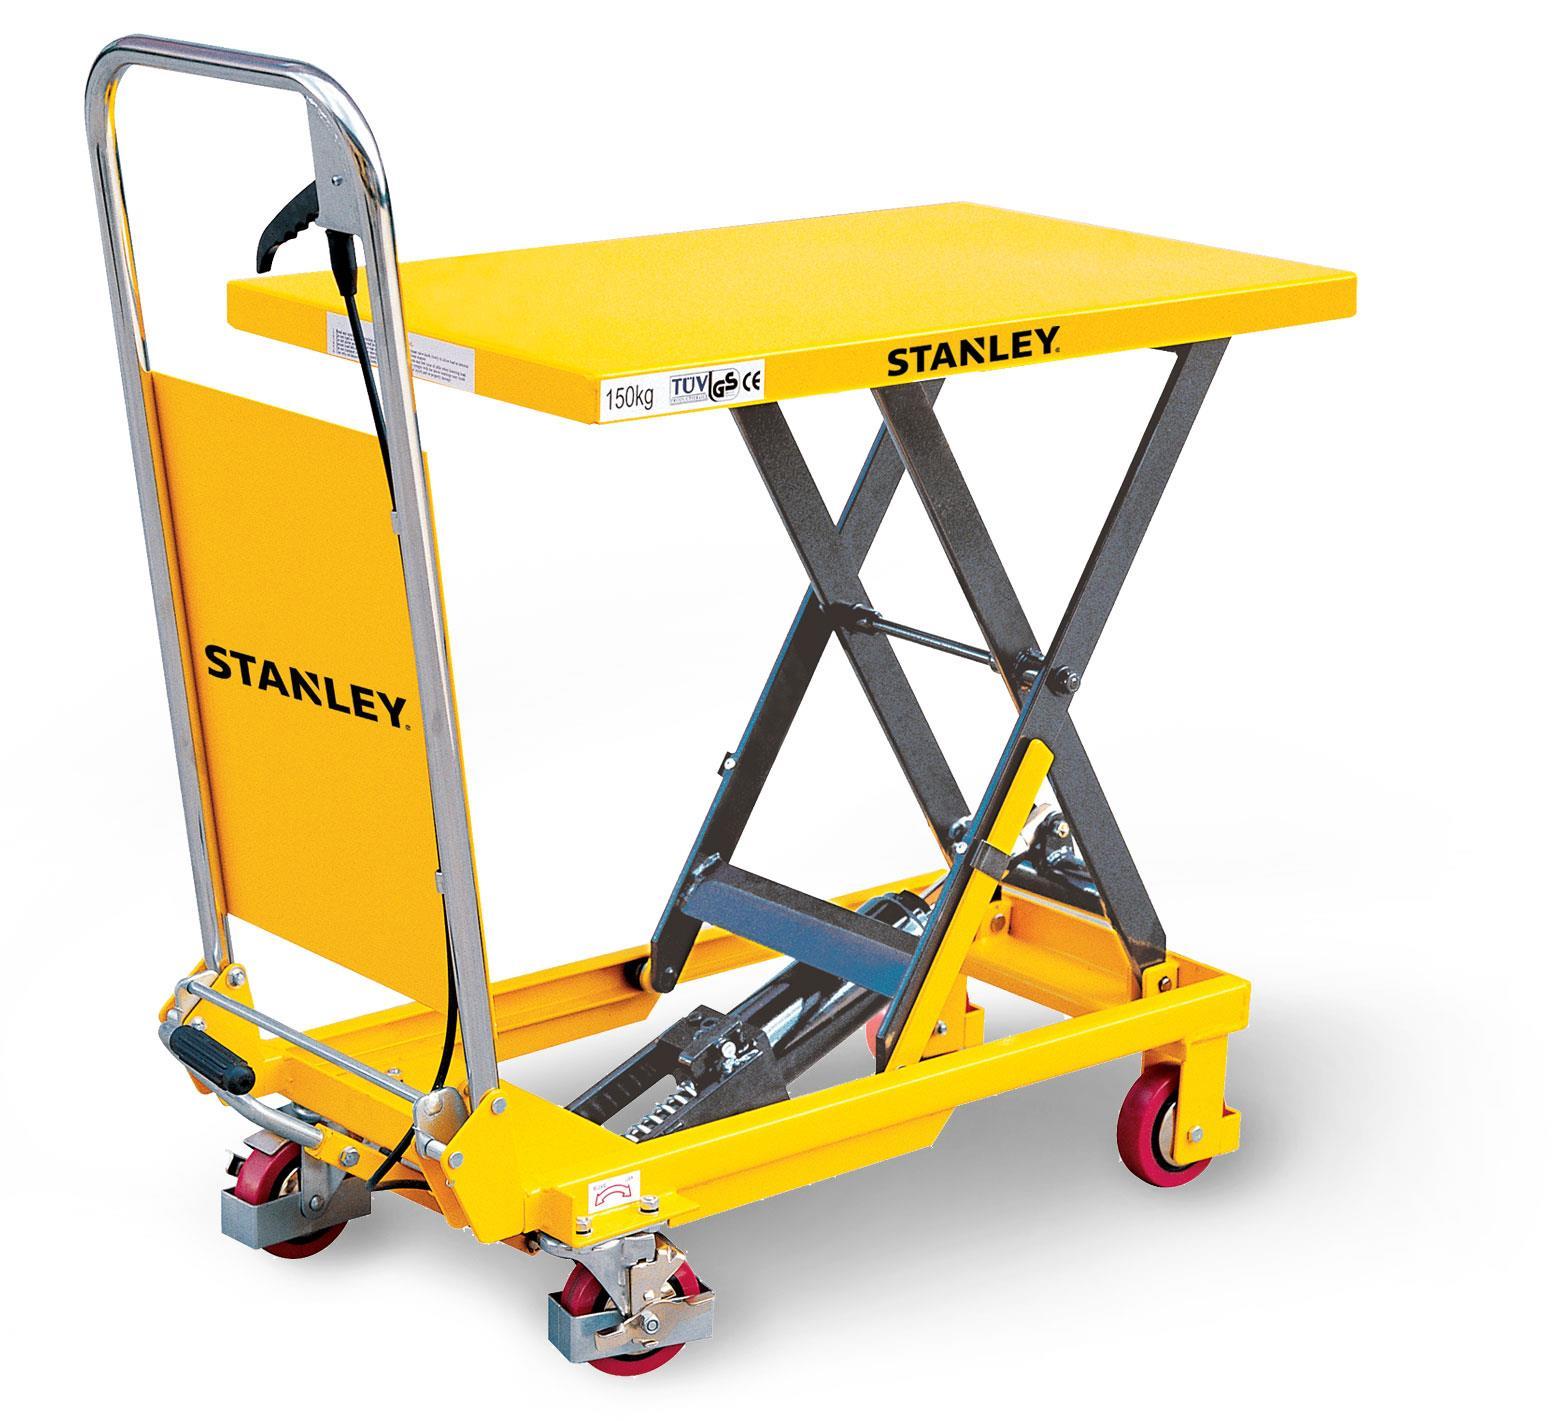 Stanley X150 150Kg Profesyonel Makaslı Platform